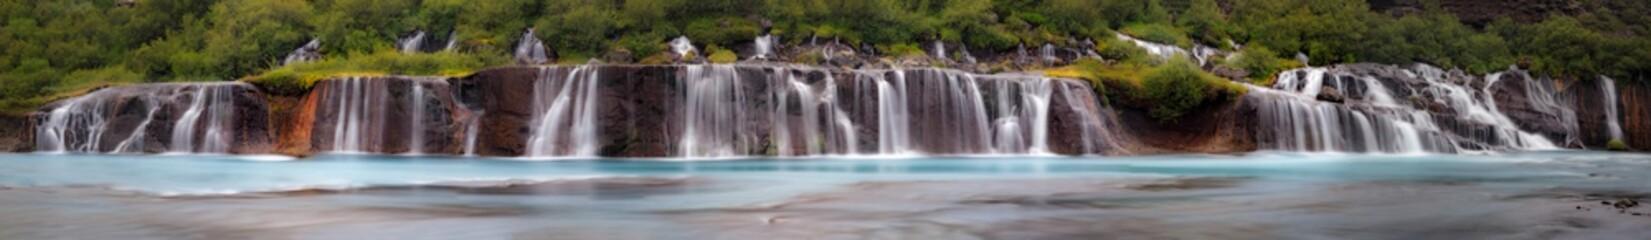 Hraudfossar Waterfall, Iceland